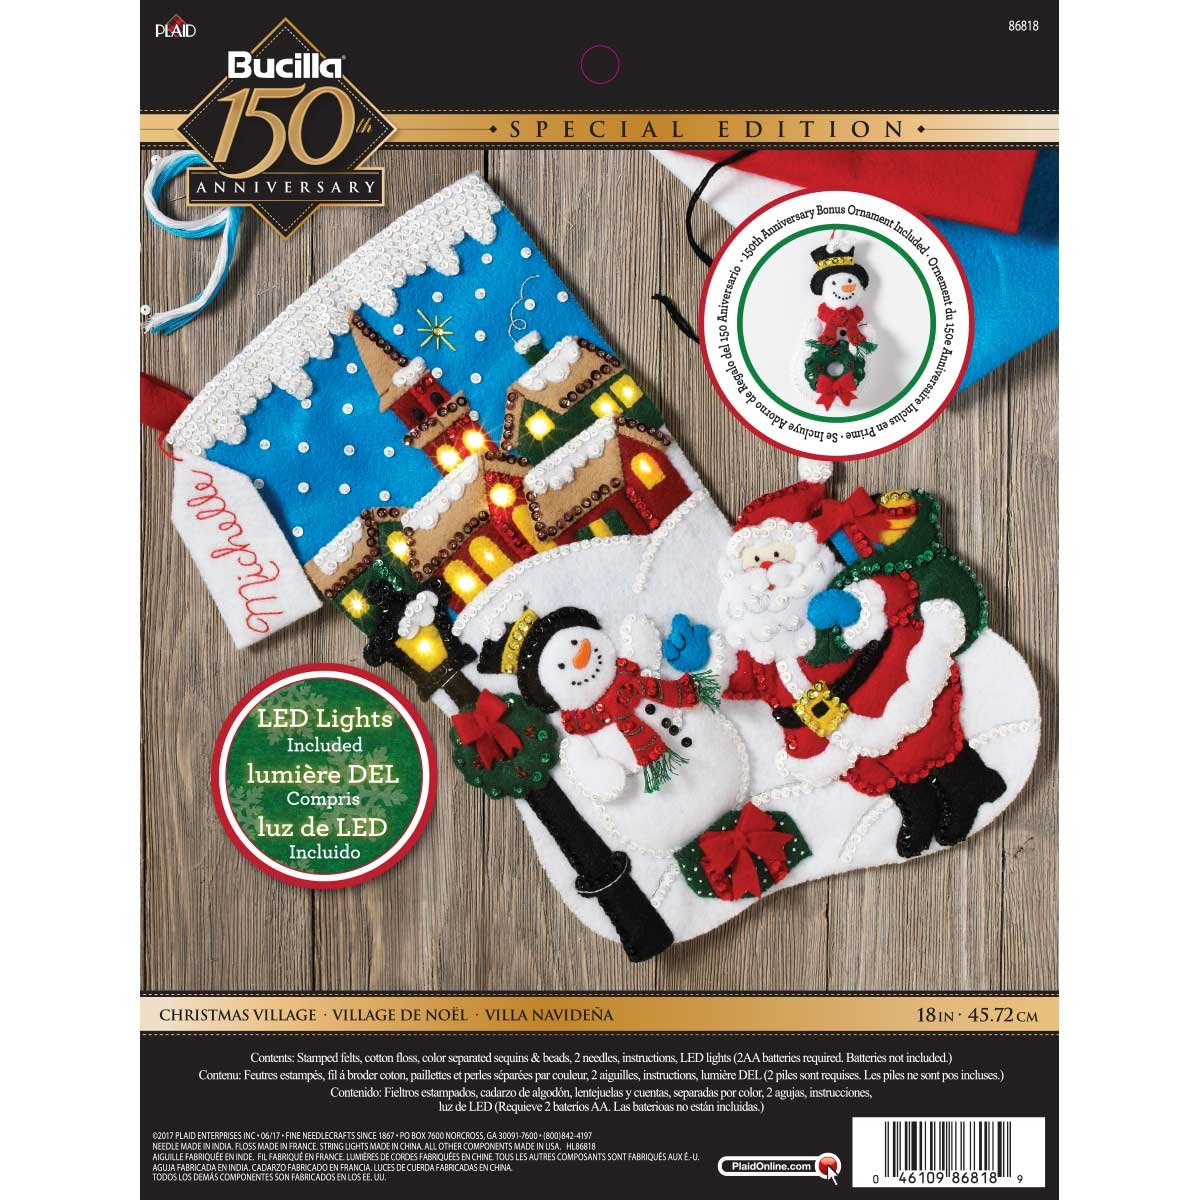 Bucilla Christmas Village Stocking Kit